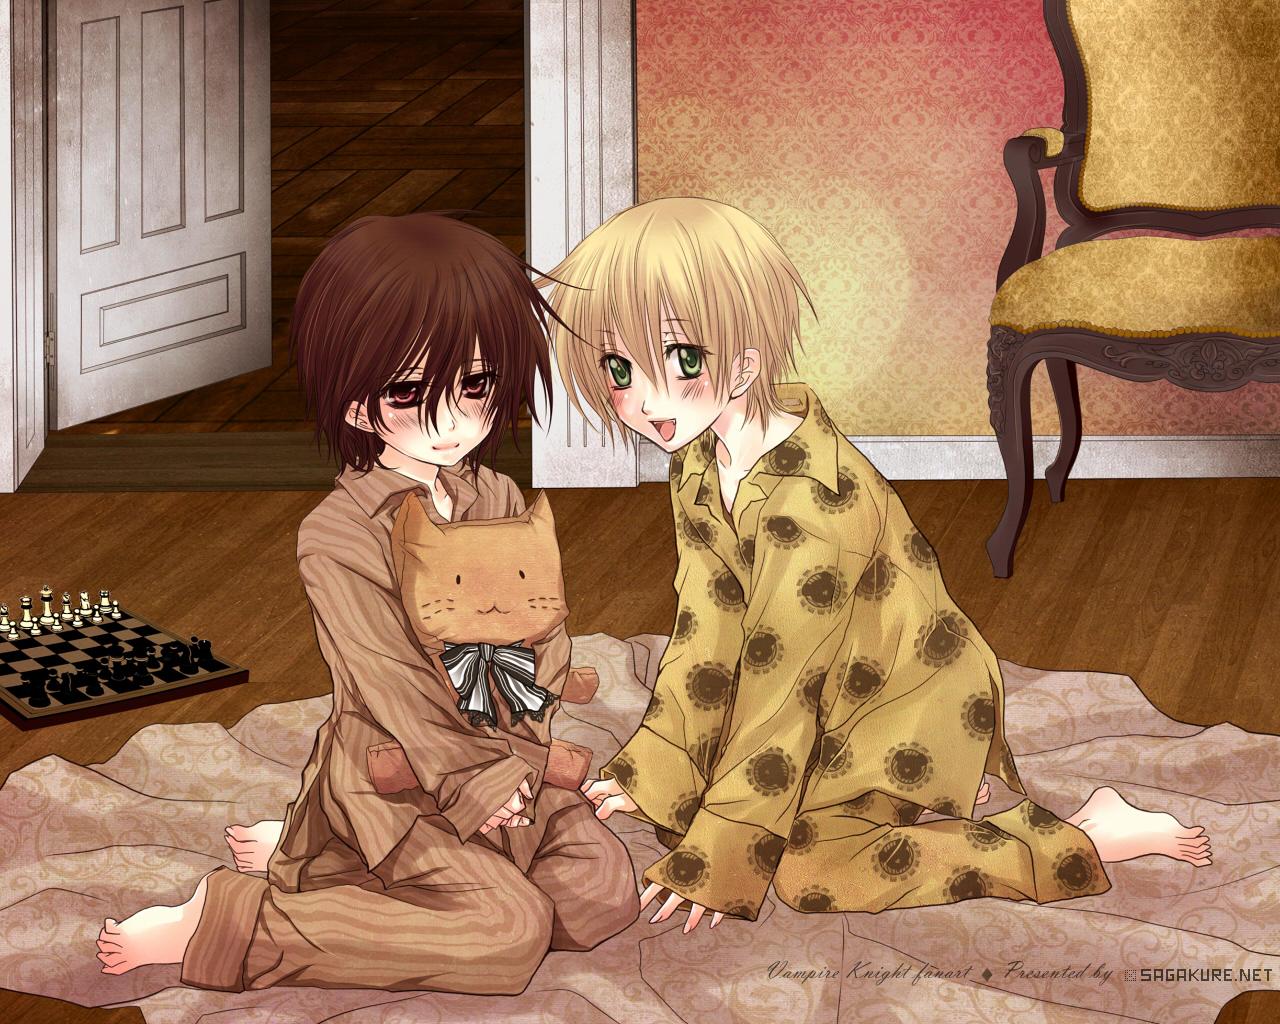 Takuma and Kaname sleepover by Sagakure